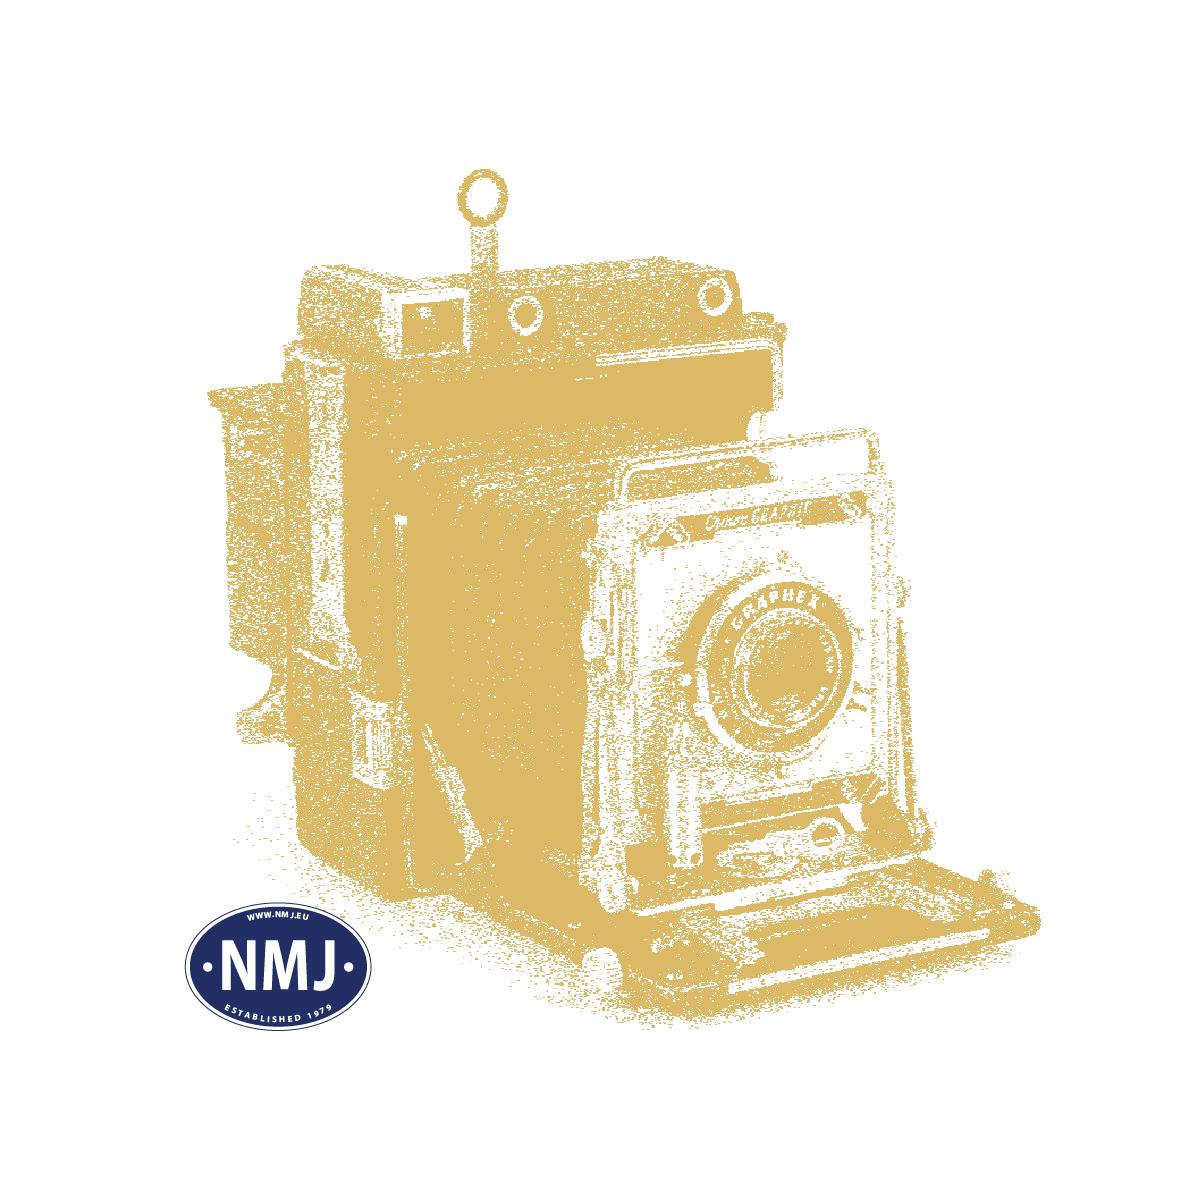 NMJST310543 - NMJ Superline NSB T3 10543 Stakevogn m/ Bremseplattform